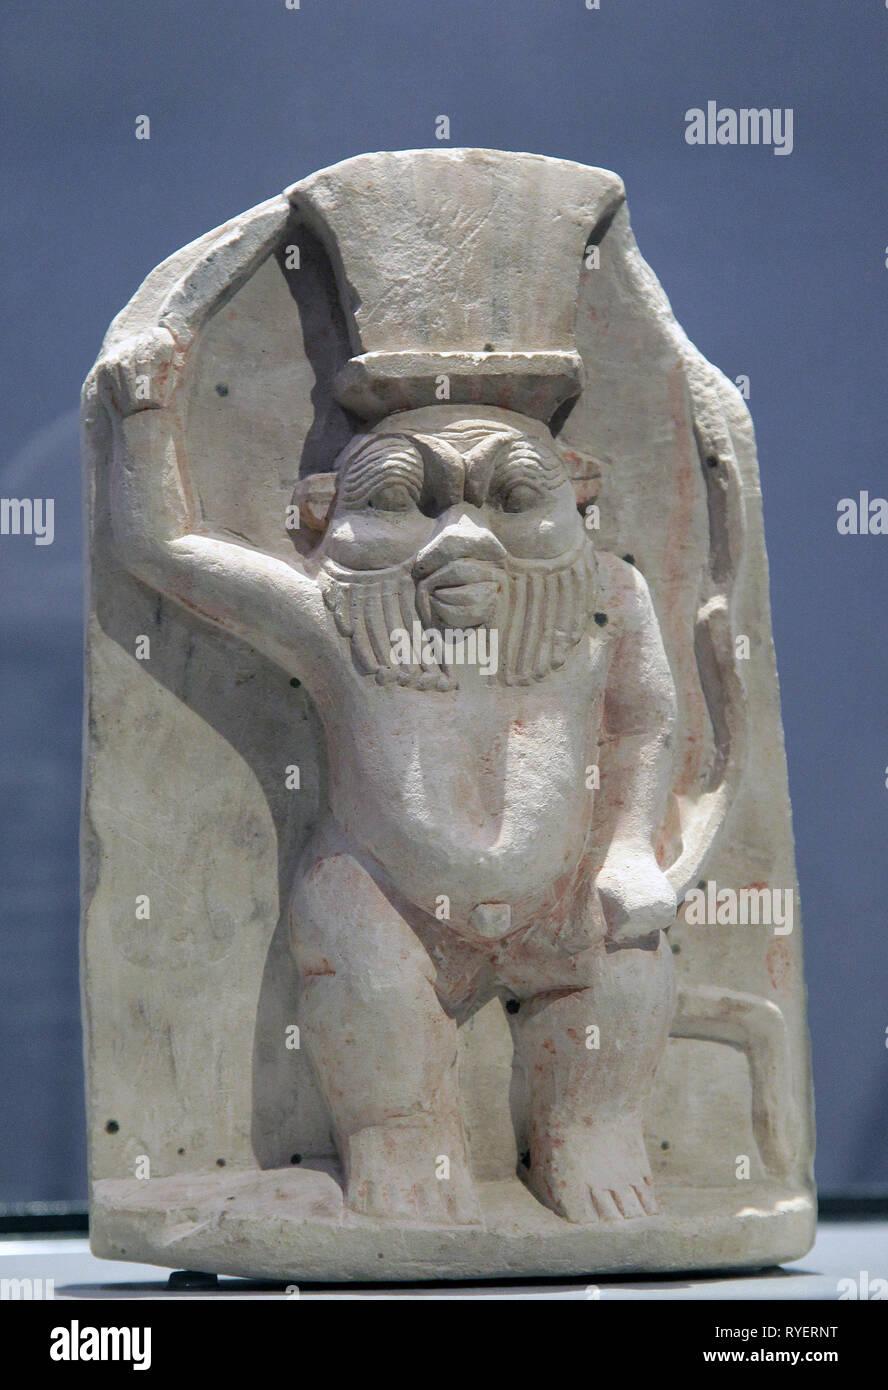 Egyptian Gods And Goddesses Stock Photos & Egyptian Gods And